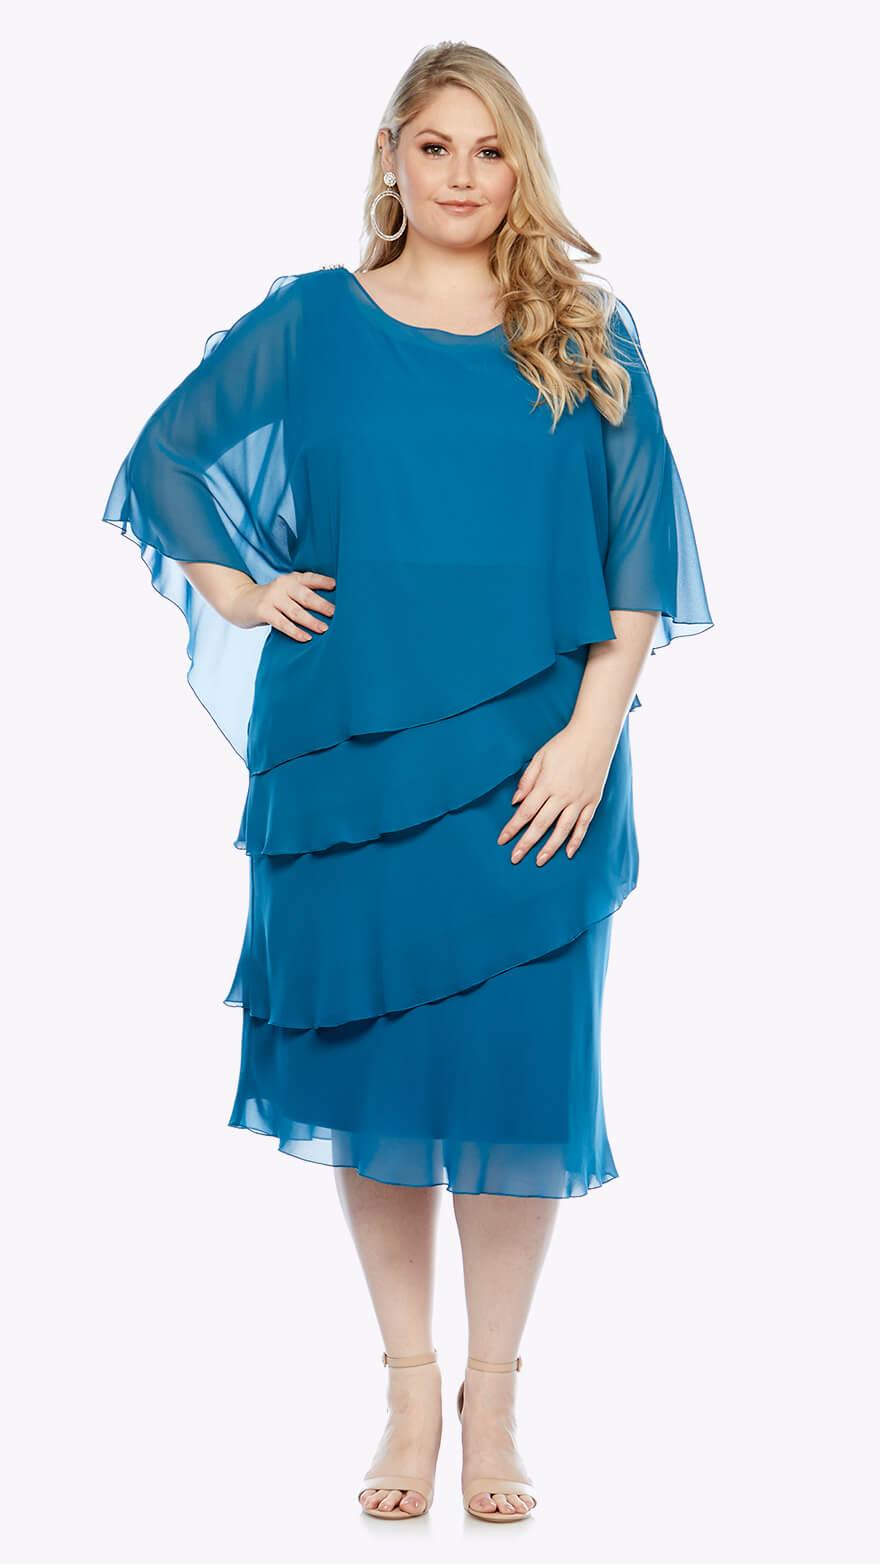 LJ0003 Chiffon layered knee-length dress with overlay and split sleeve detail